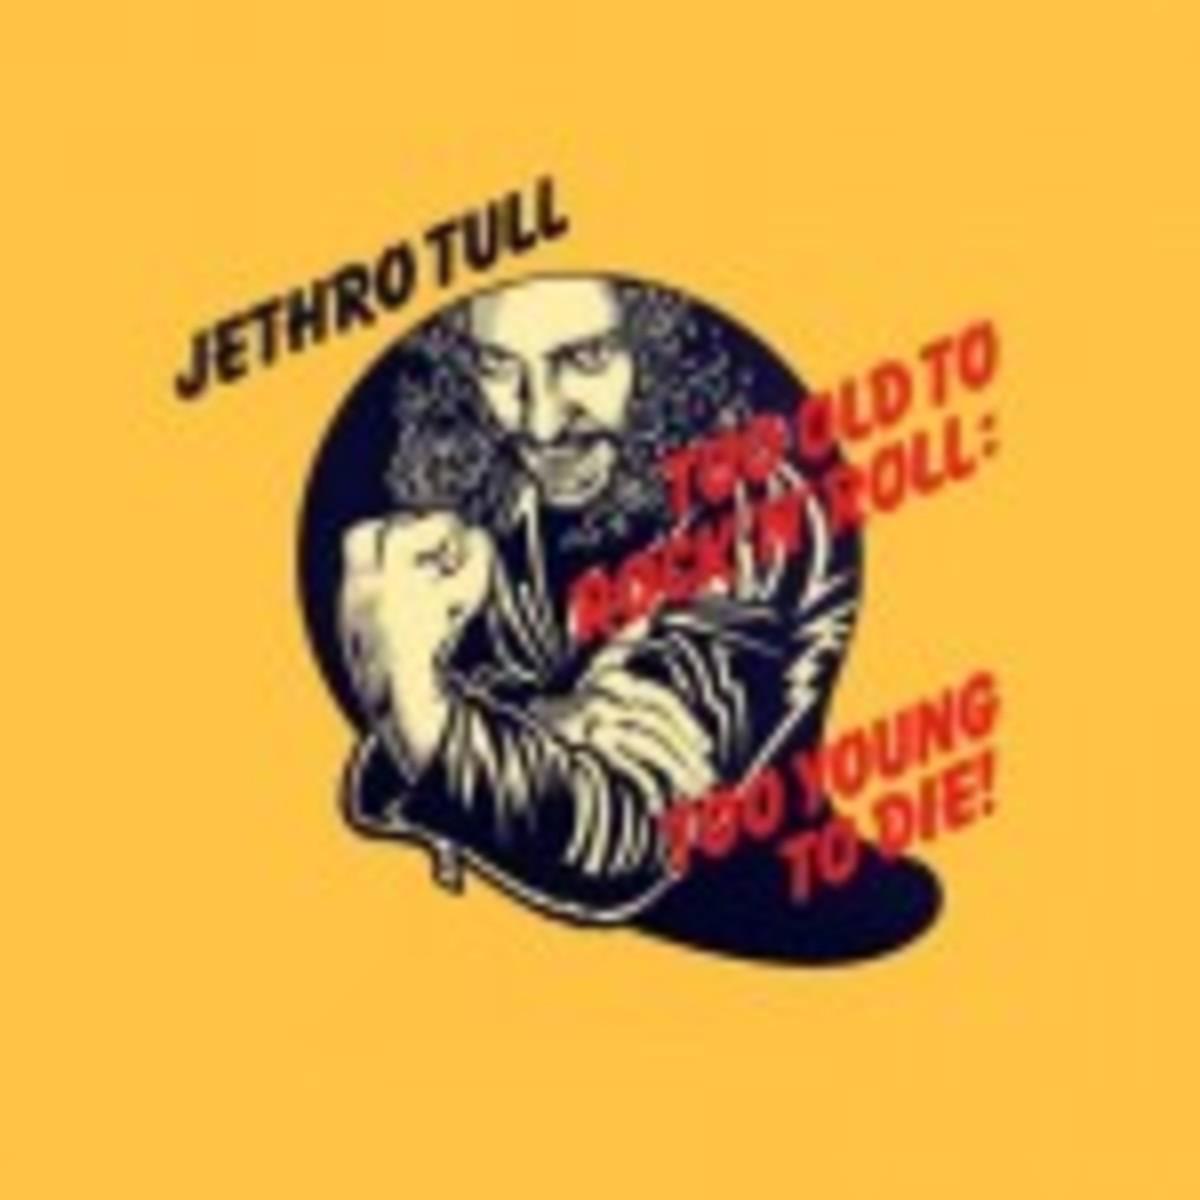 jethro